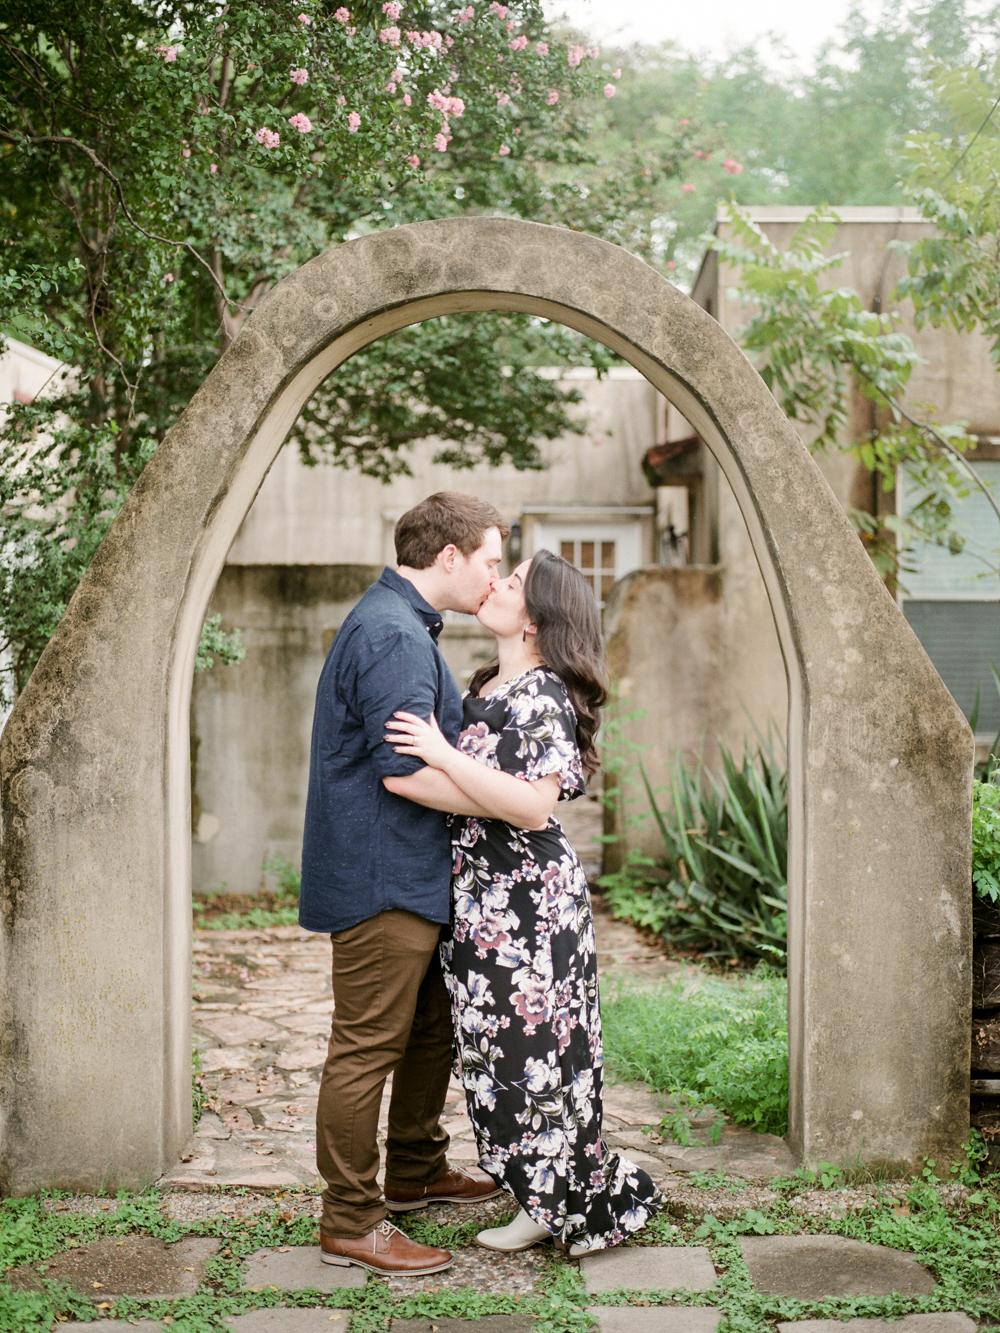 Austin film photographer - Christine Gosch-2.jpg